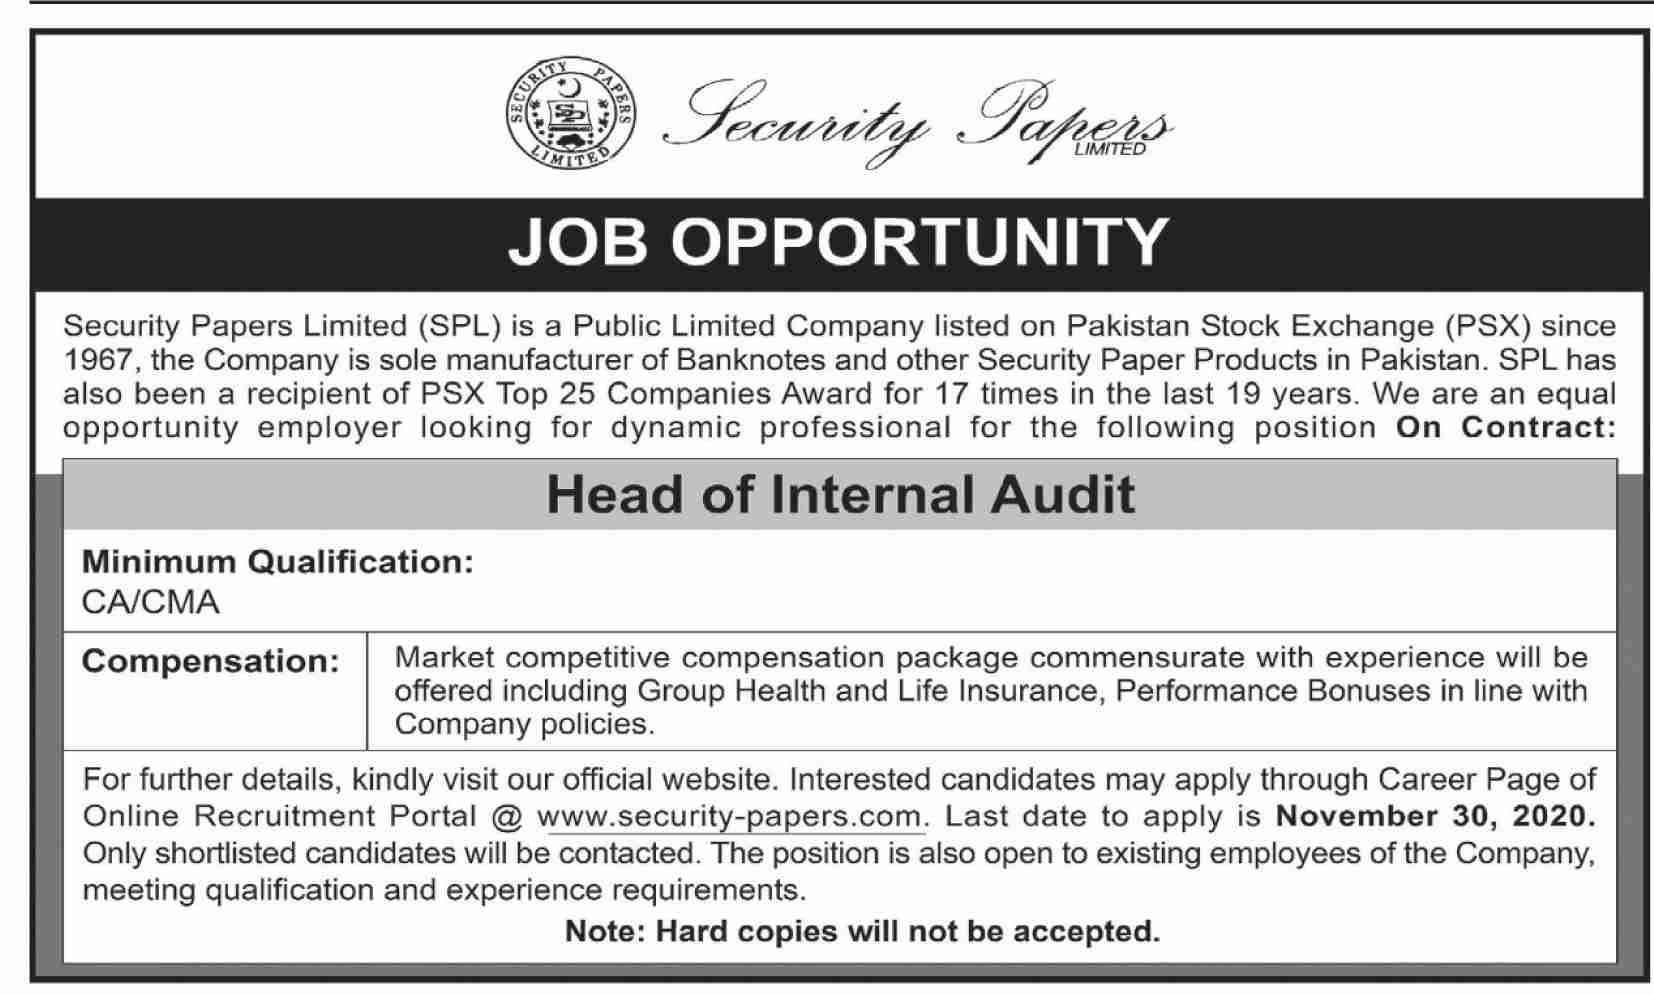 Head of Internal Audit Job in Karachi